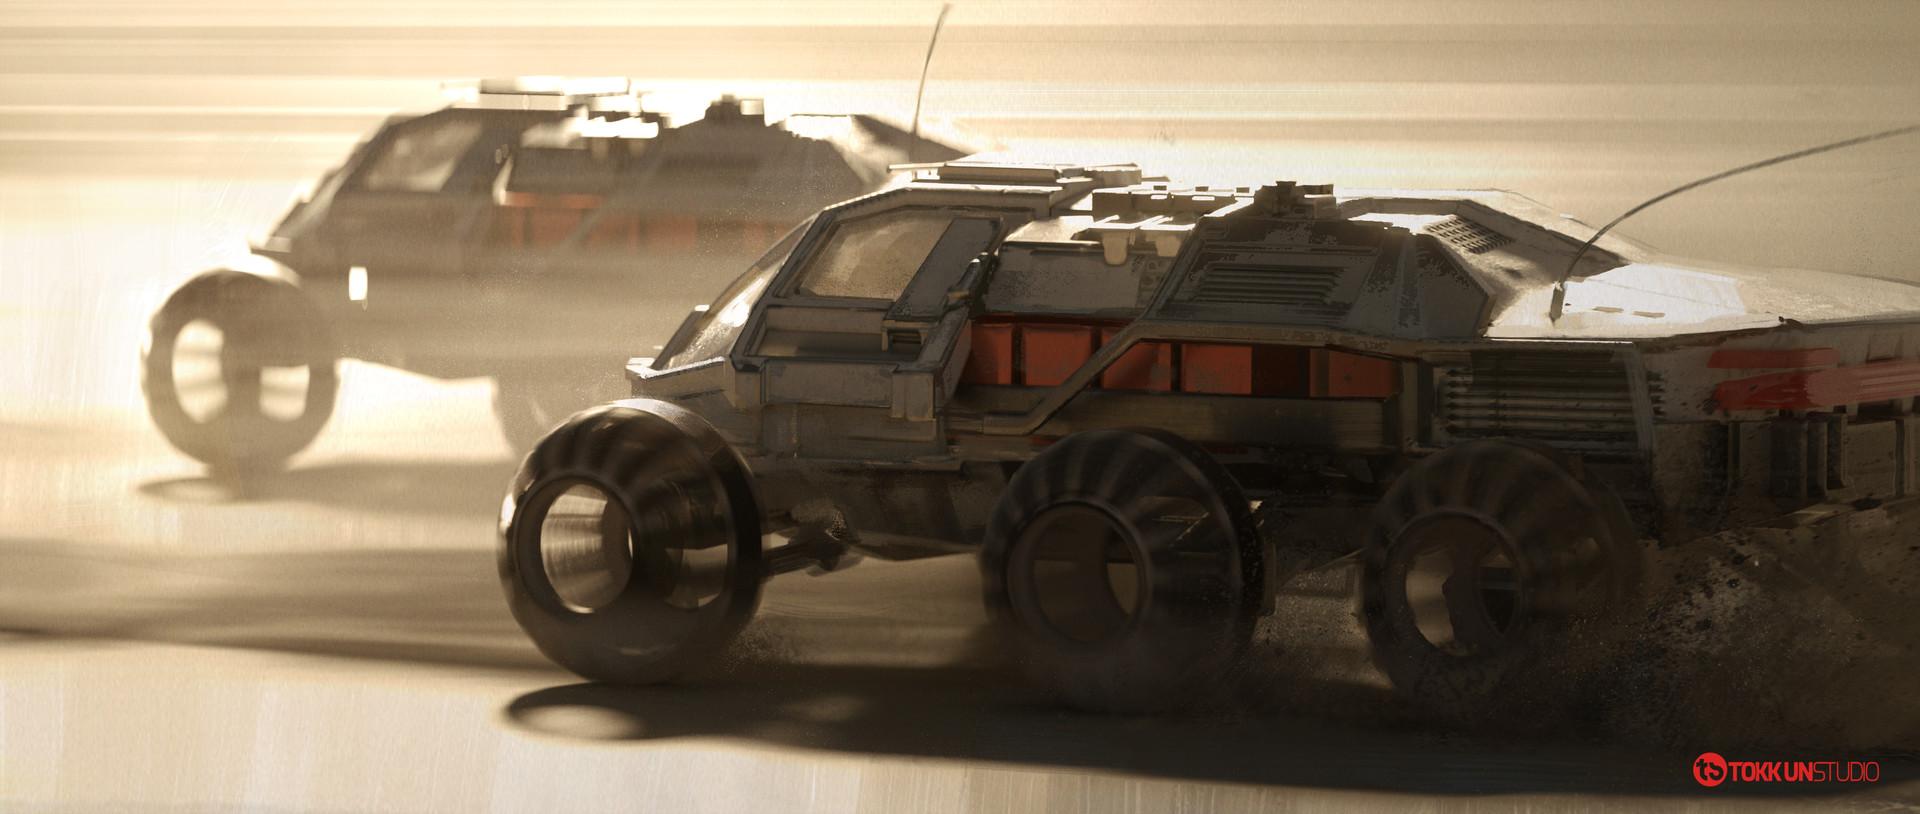 Tokkun studio rover ts concept 3